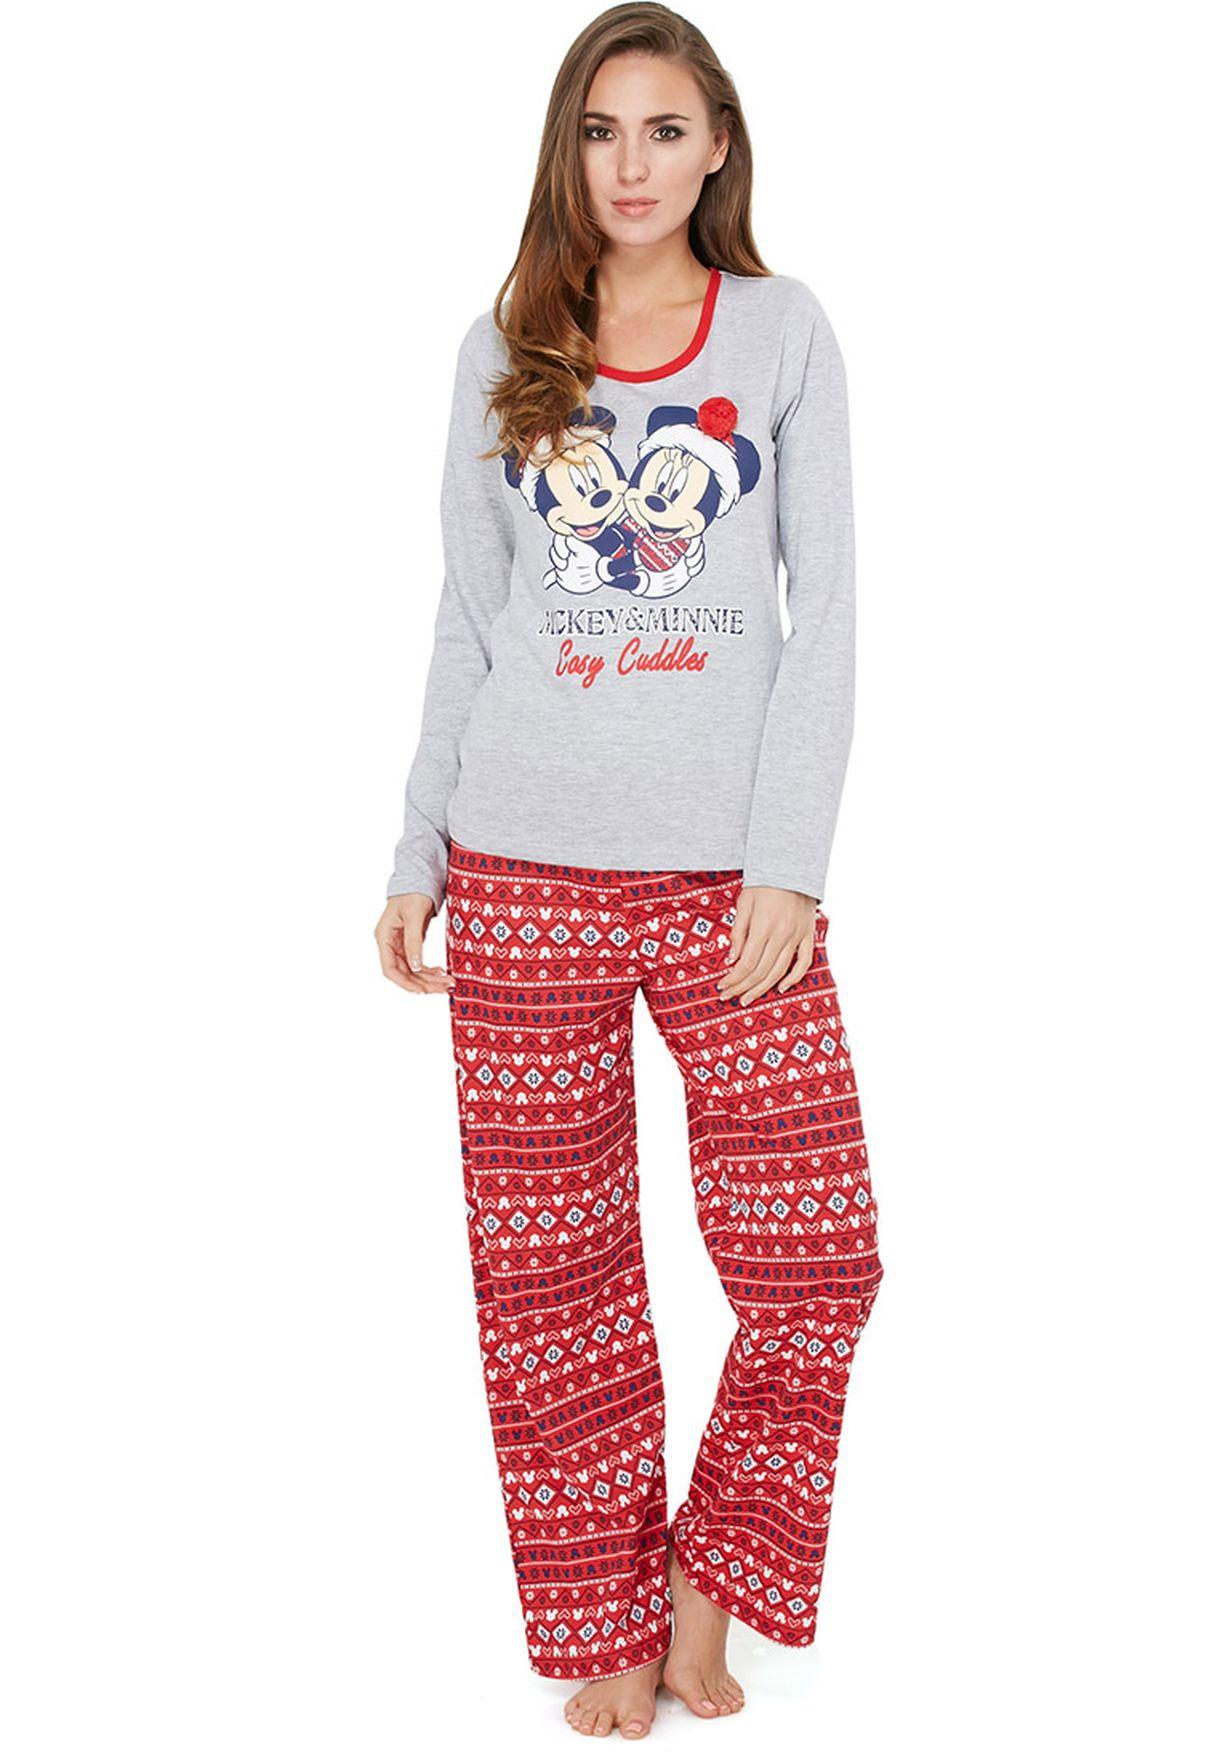 8993cb63dbb364 Shop Disney multicolor Mickey Mouse Pyjama Set for Women in UAE ...